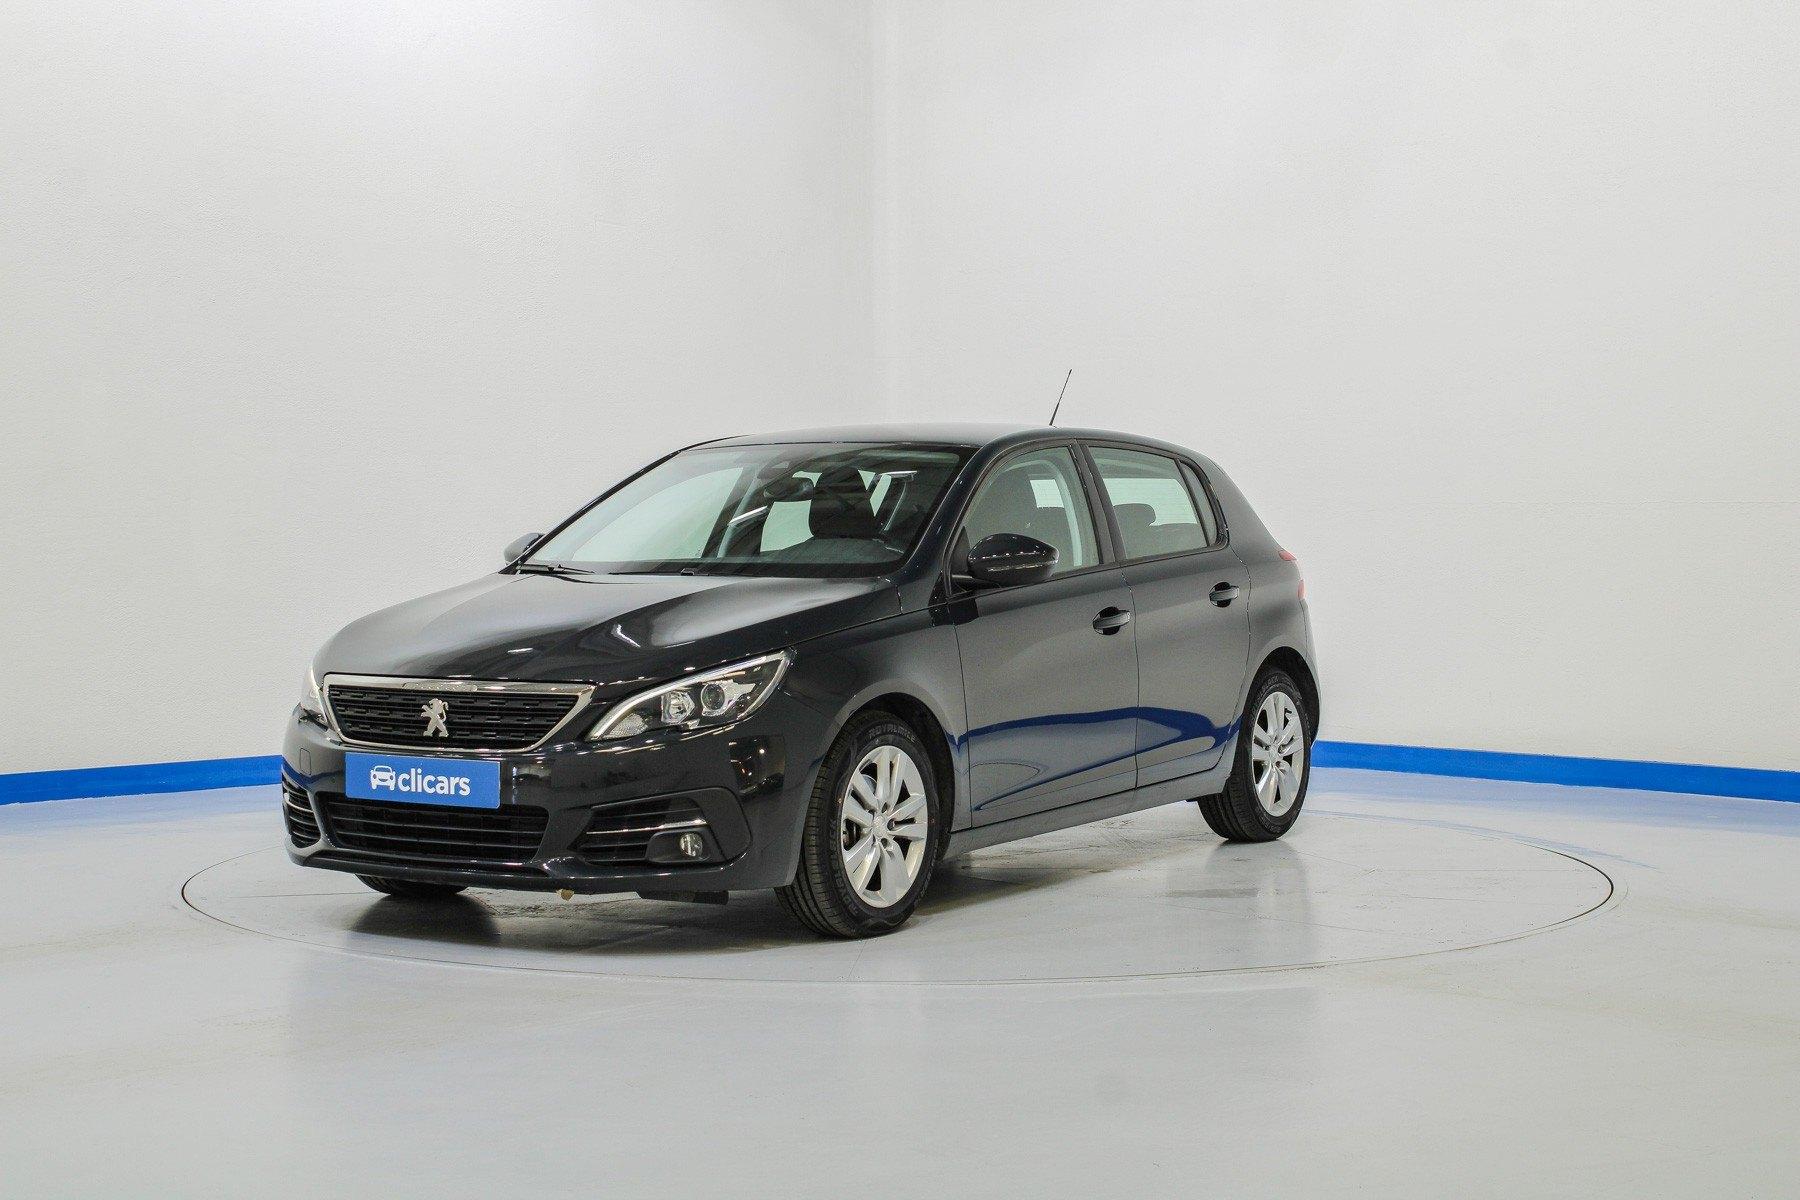 Peugeot 308 Diésel 5p Active 1.6 BlueHDi 88KW (120CV) EAT6 1